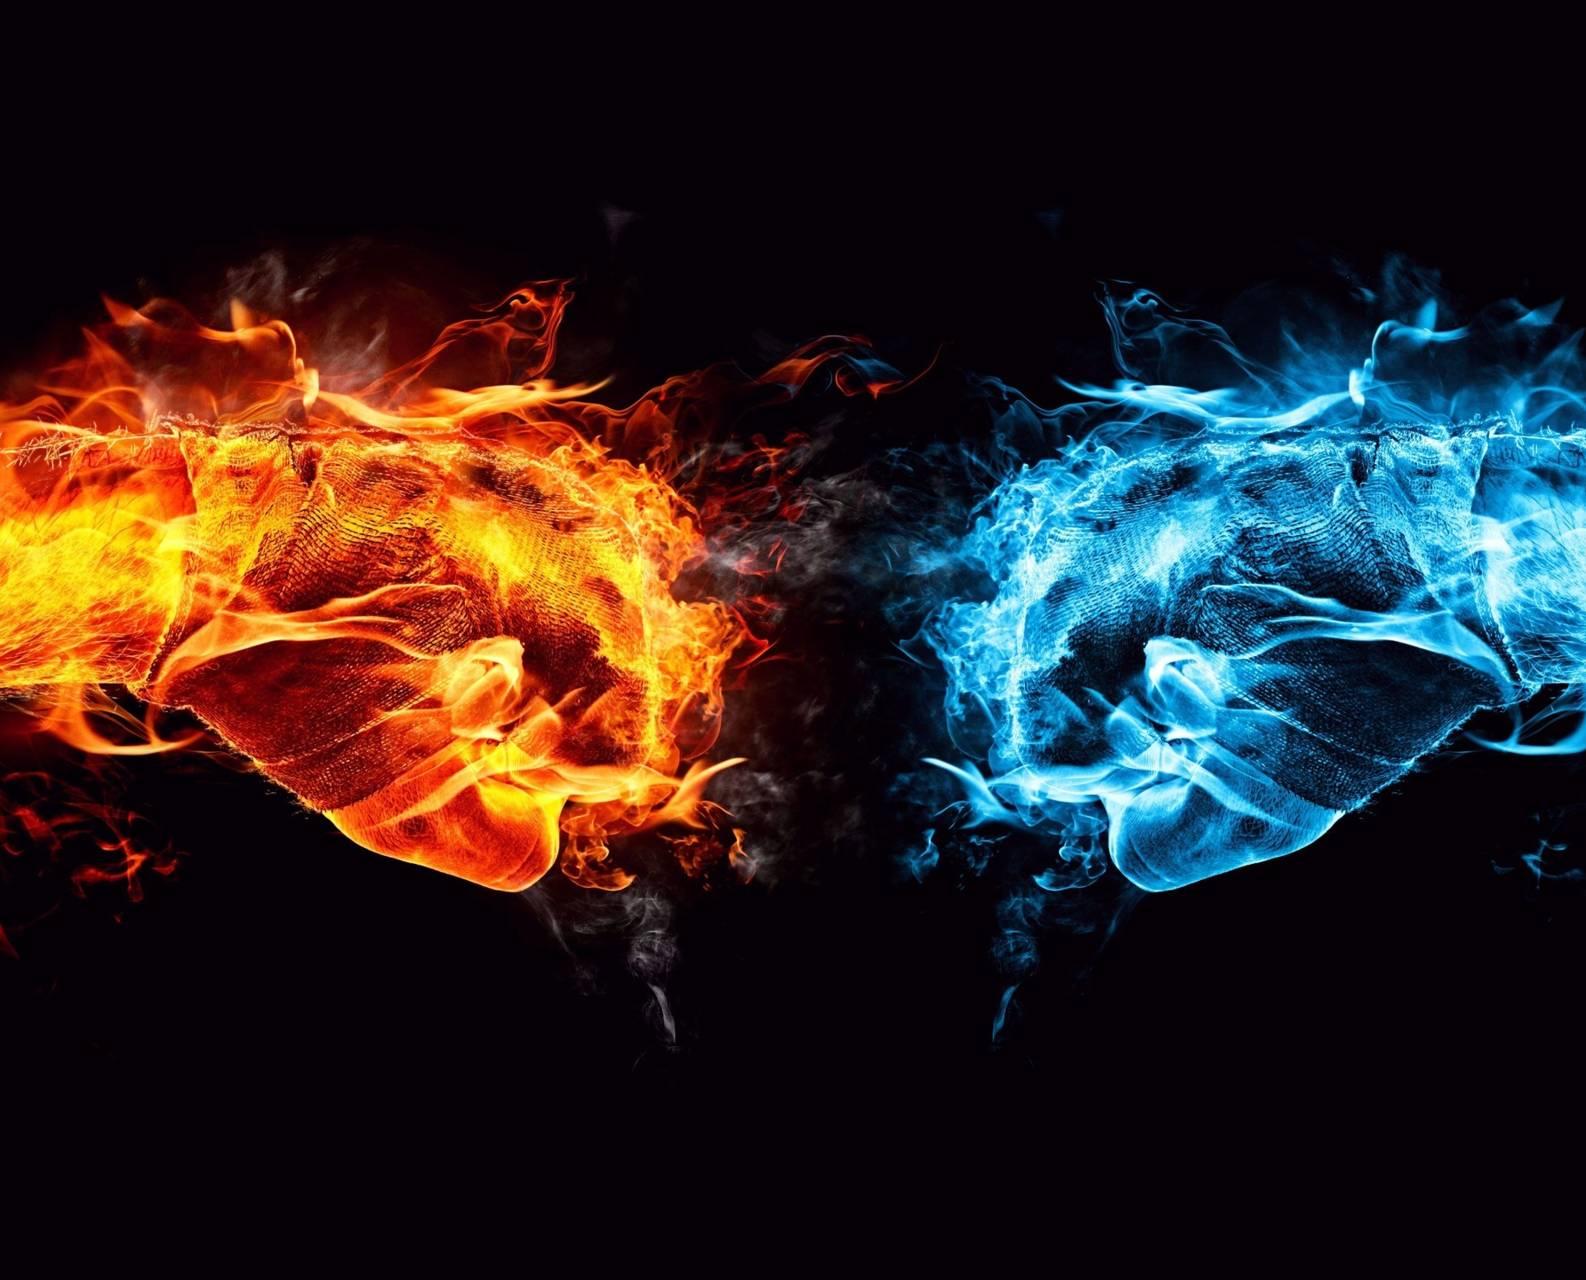 Fire Ice Fist